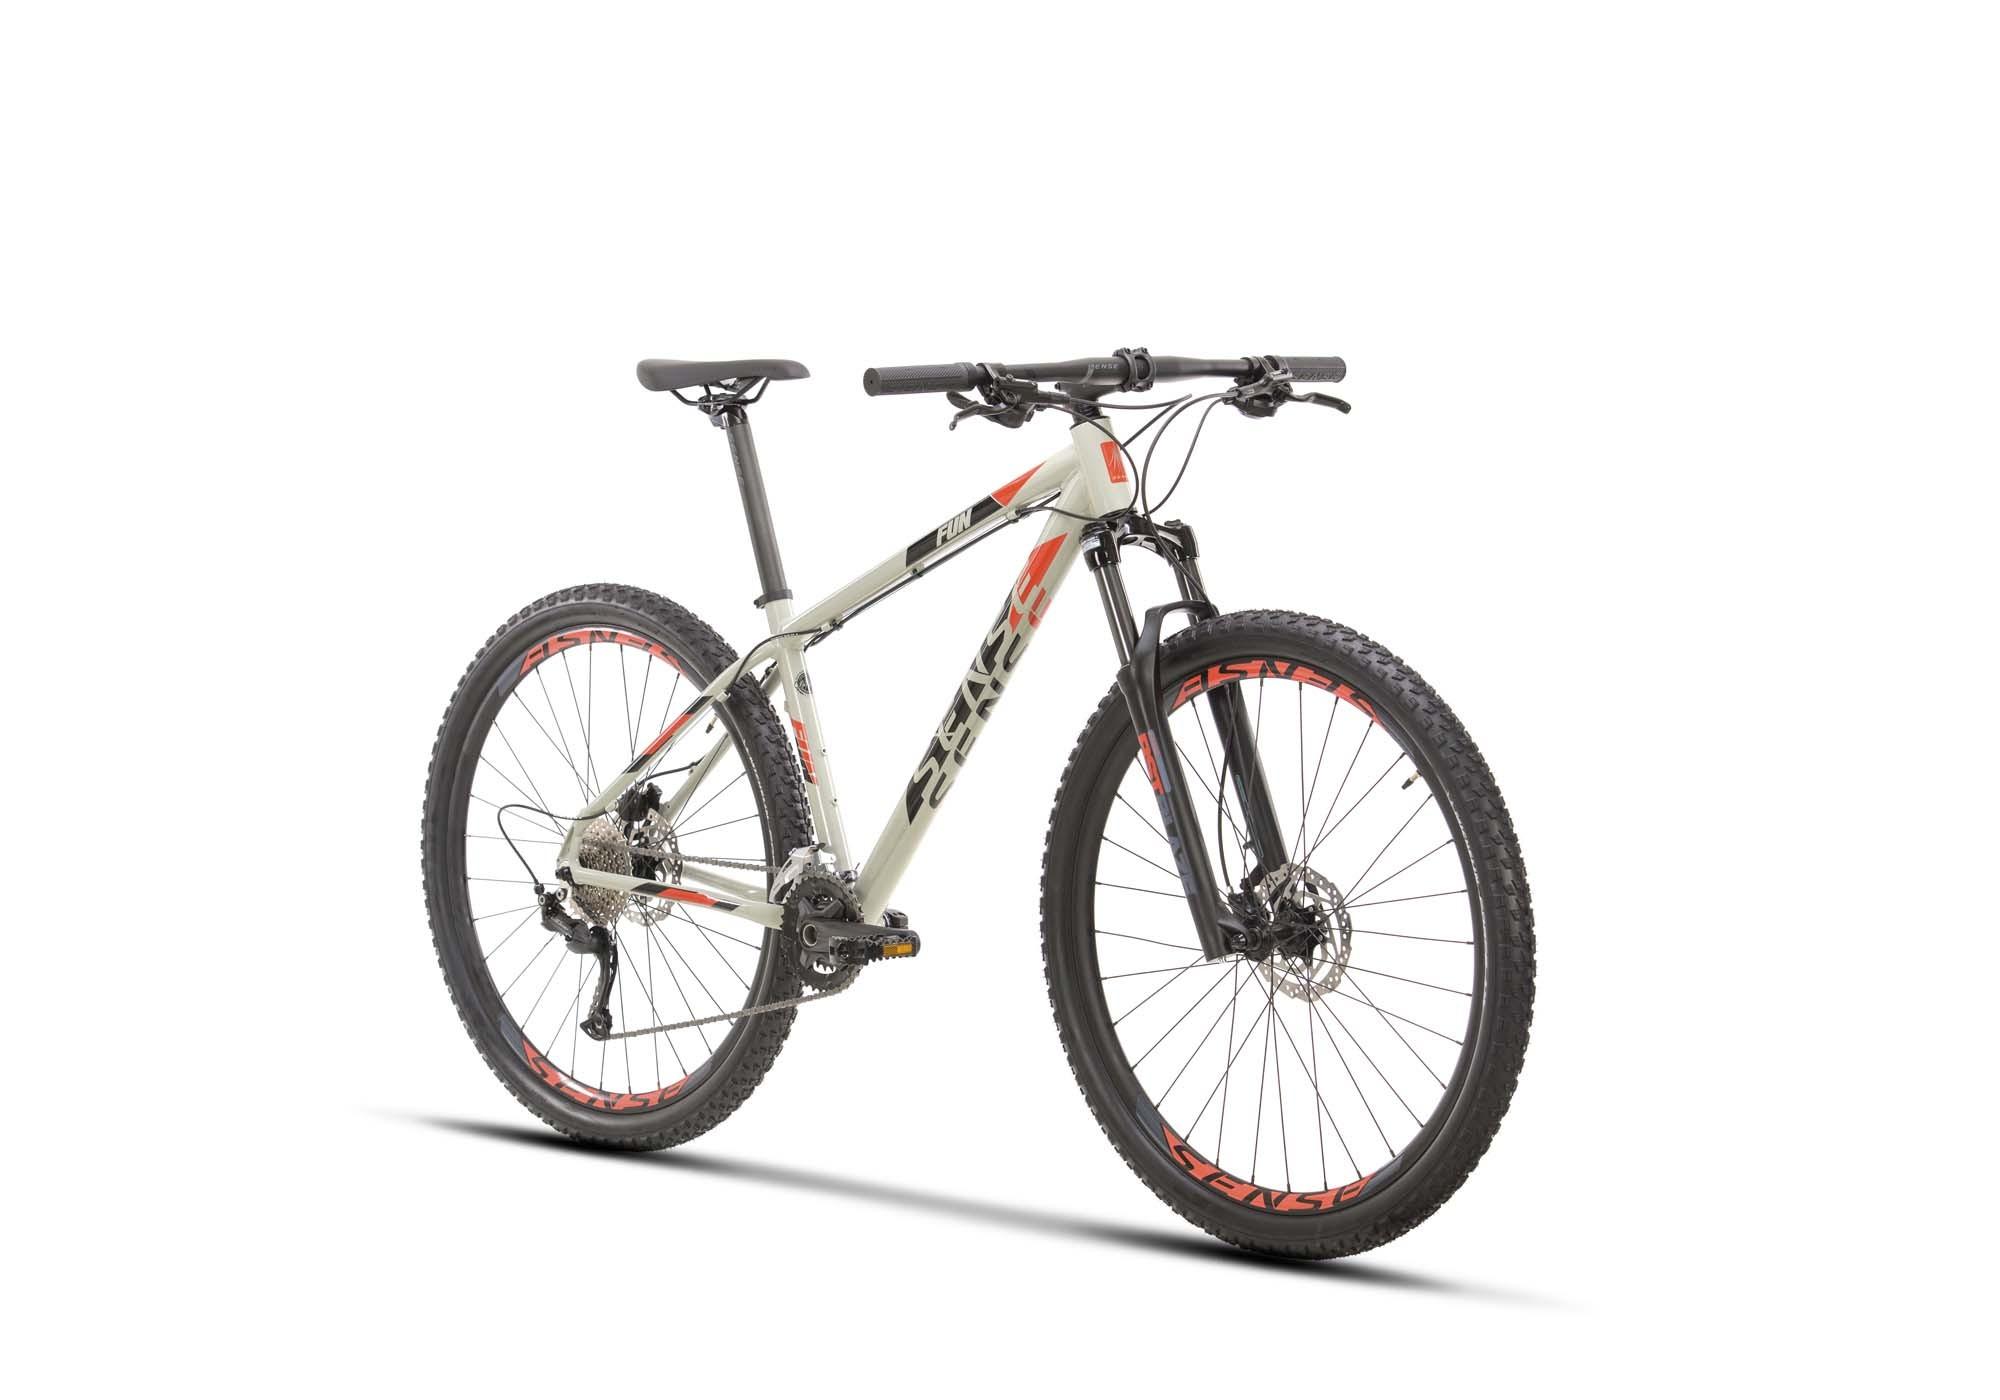 Bicicleta SENSE Fun Evo 2021 - 18v Shimano Alivio - Freio Hidráulico